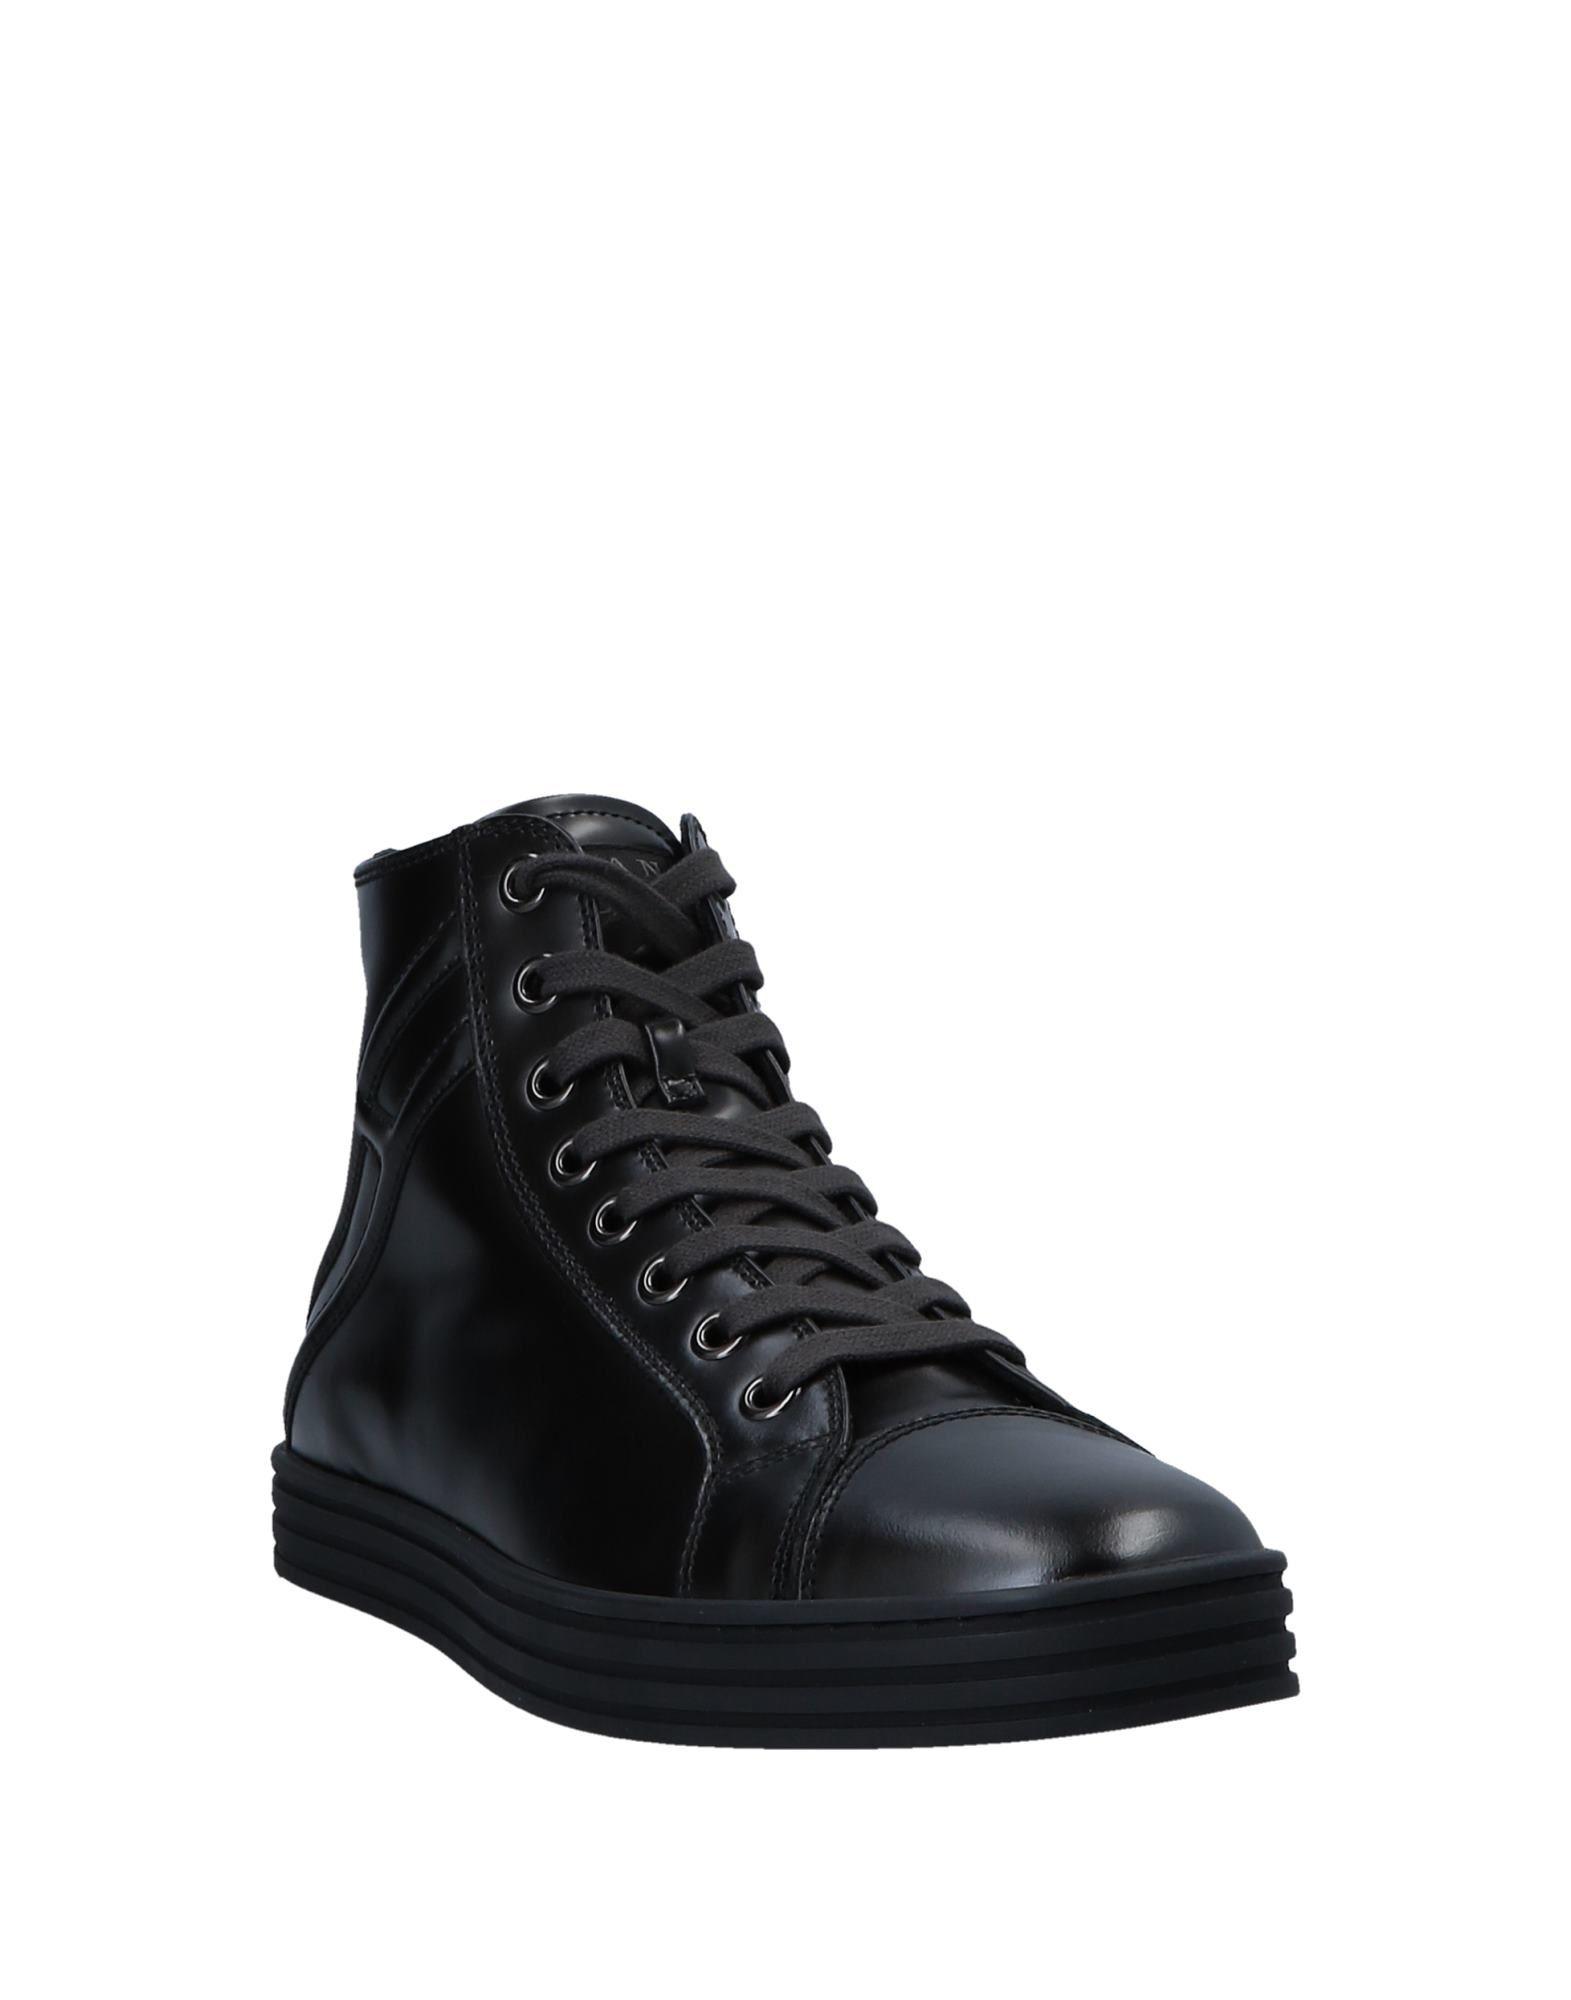 Hogan Rebel Sneakers Herren  Schuhe 11560028DW Gute Qualität beliebte Schuhe  715c6b